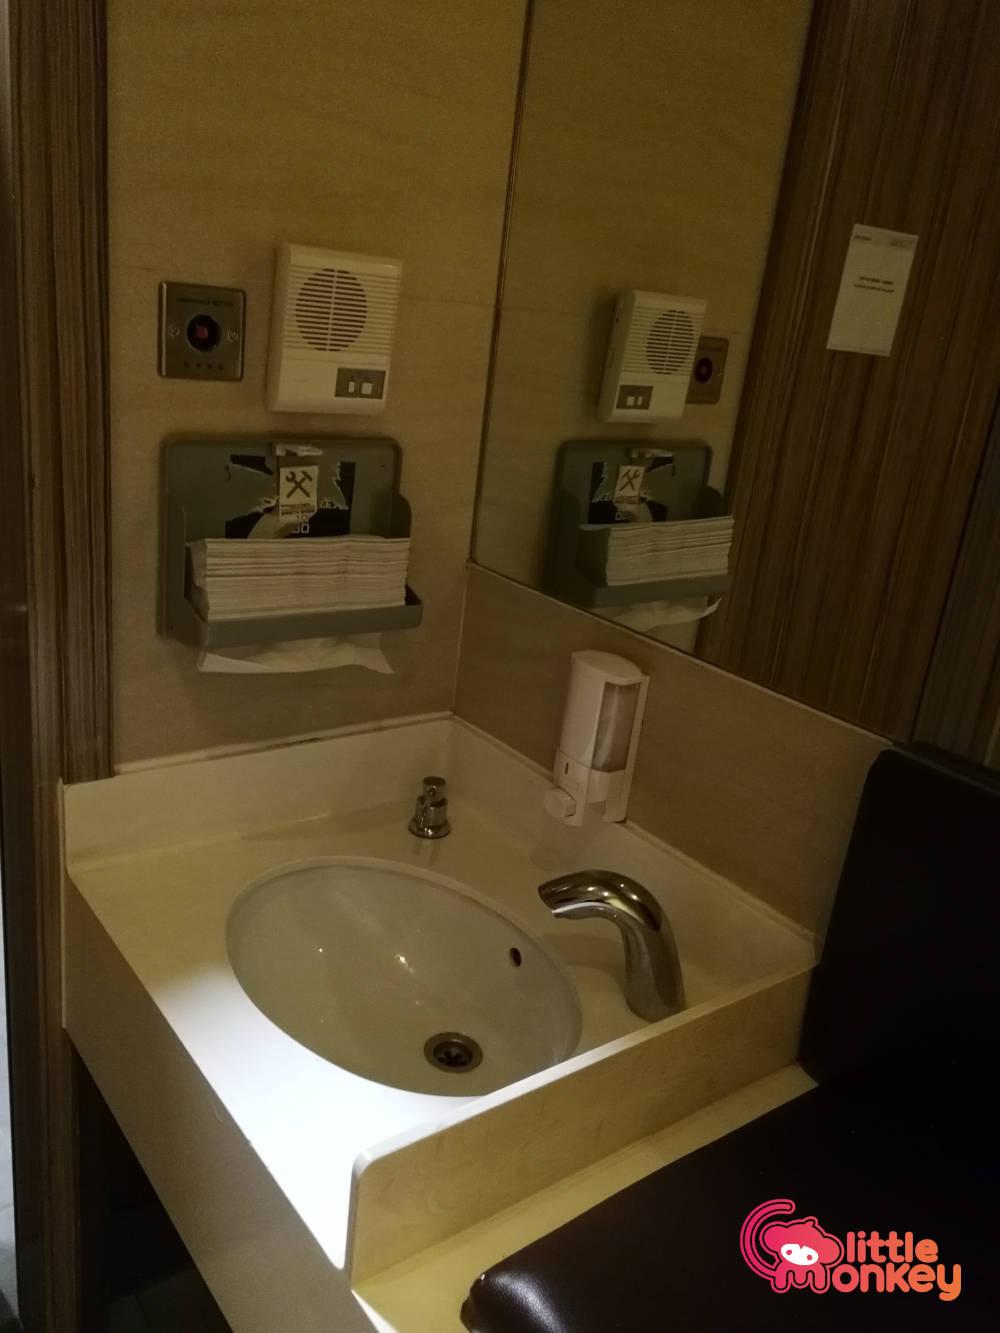 Tseung Kwan O's basin in nursery room